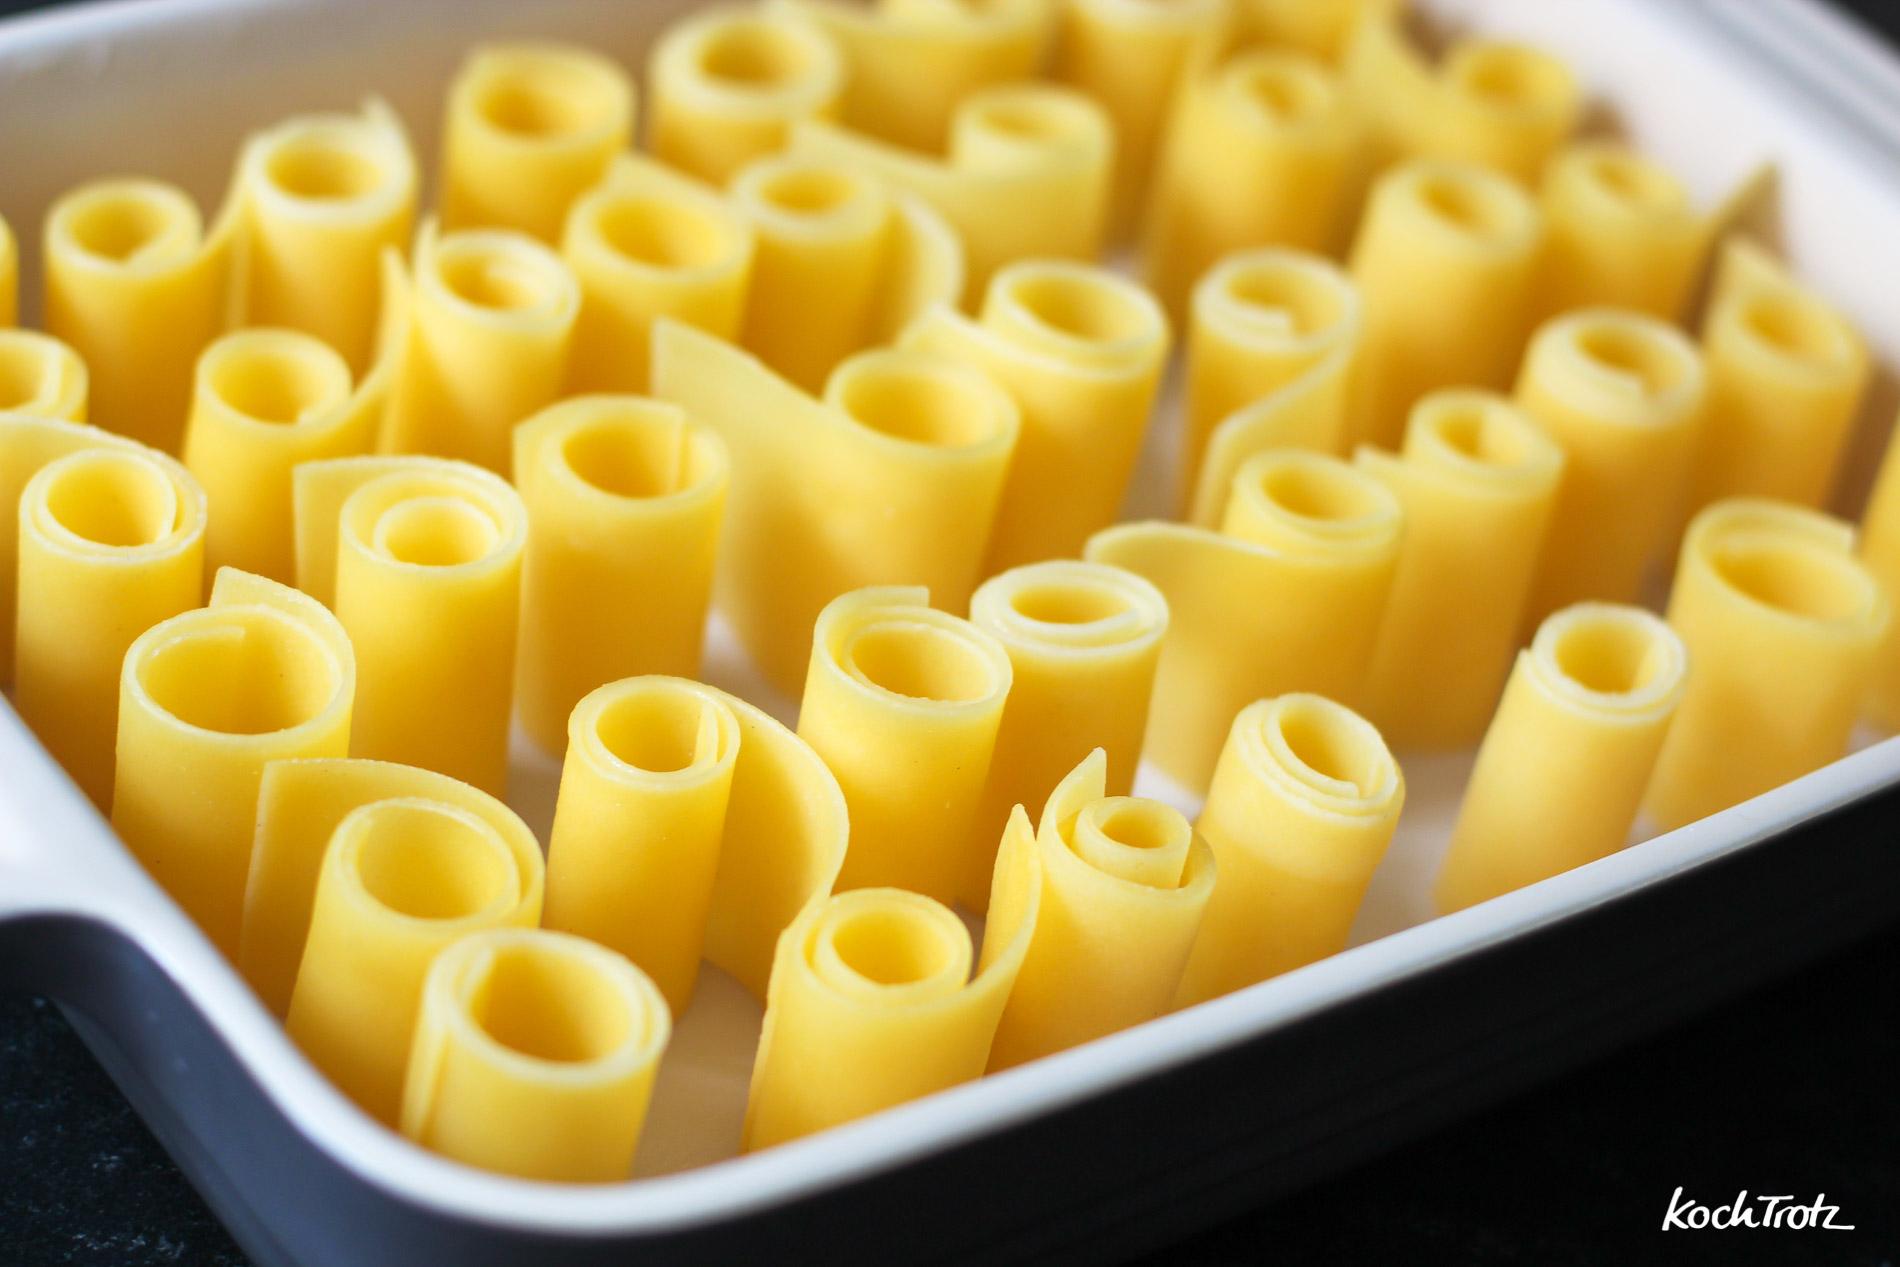 Lasagne-gerollt-klassiger-mal-anders-glutenfrei-eifrei-laktosefrei-4